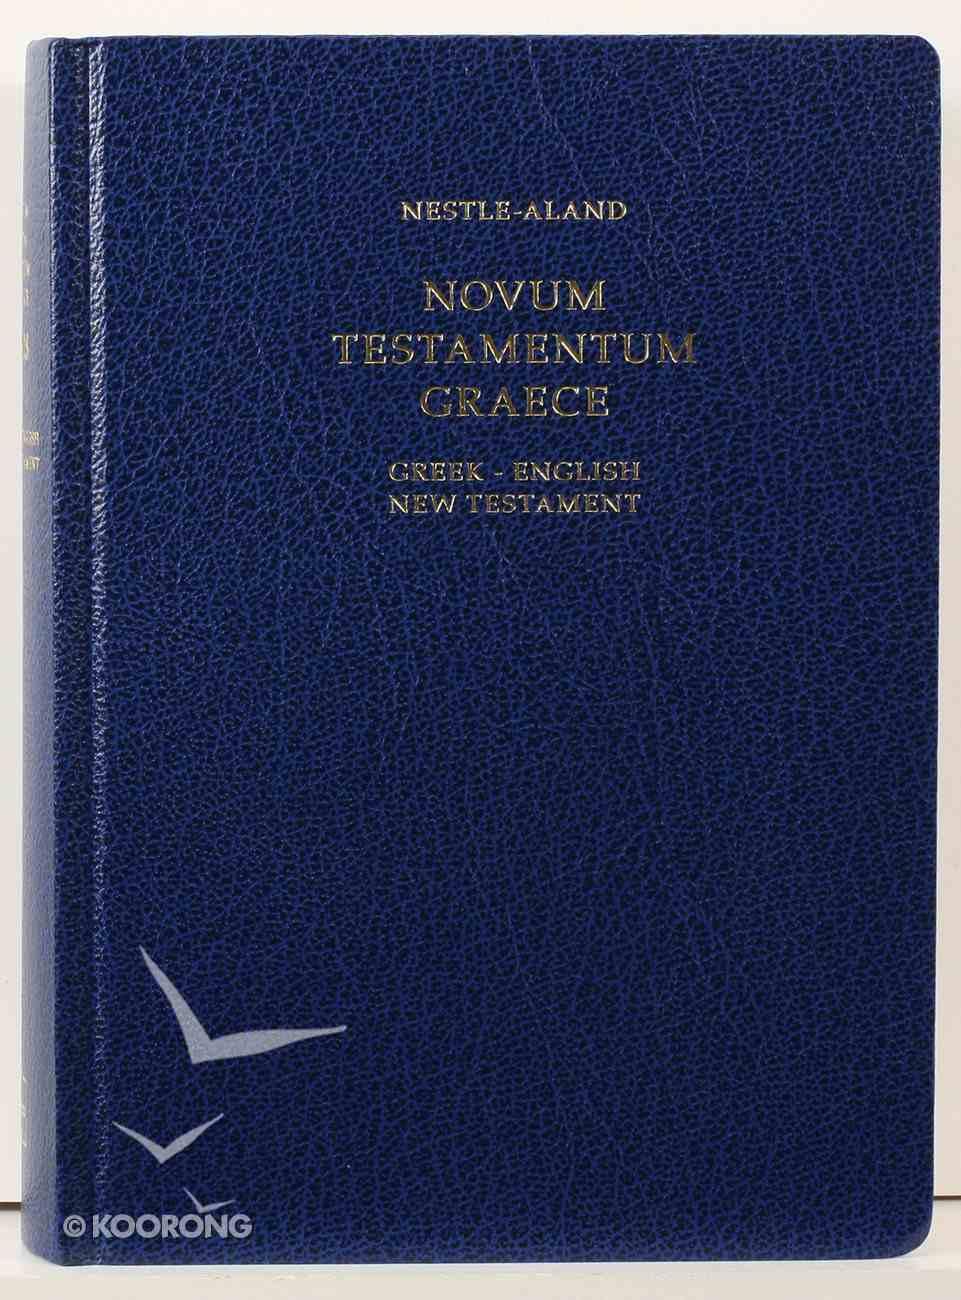 Nestle-Aland Novum Testamentum Graece Navy (28th Edition Greek-english New Testament Nrsb And Reb) Hardback